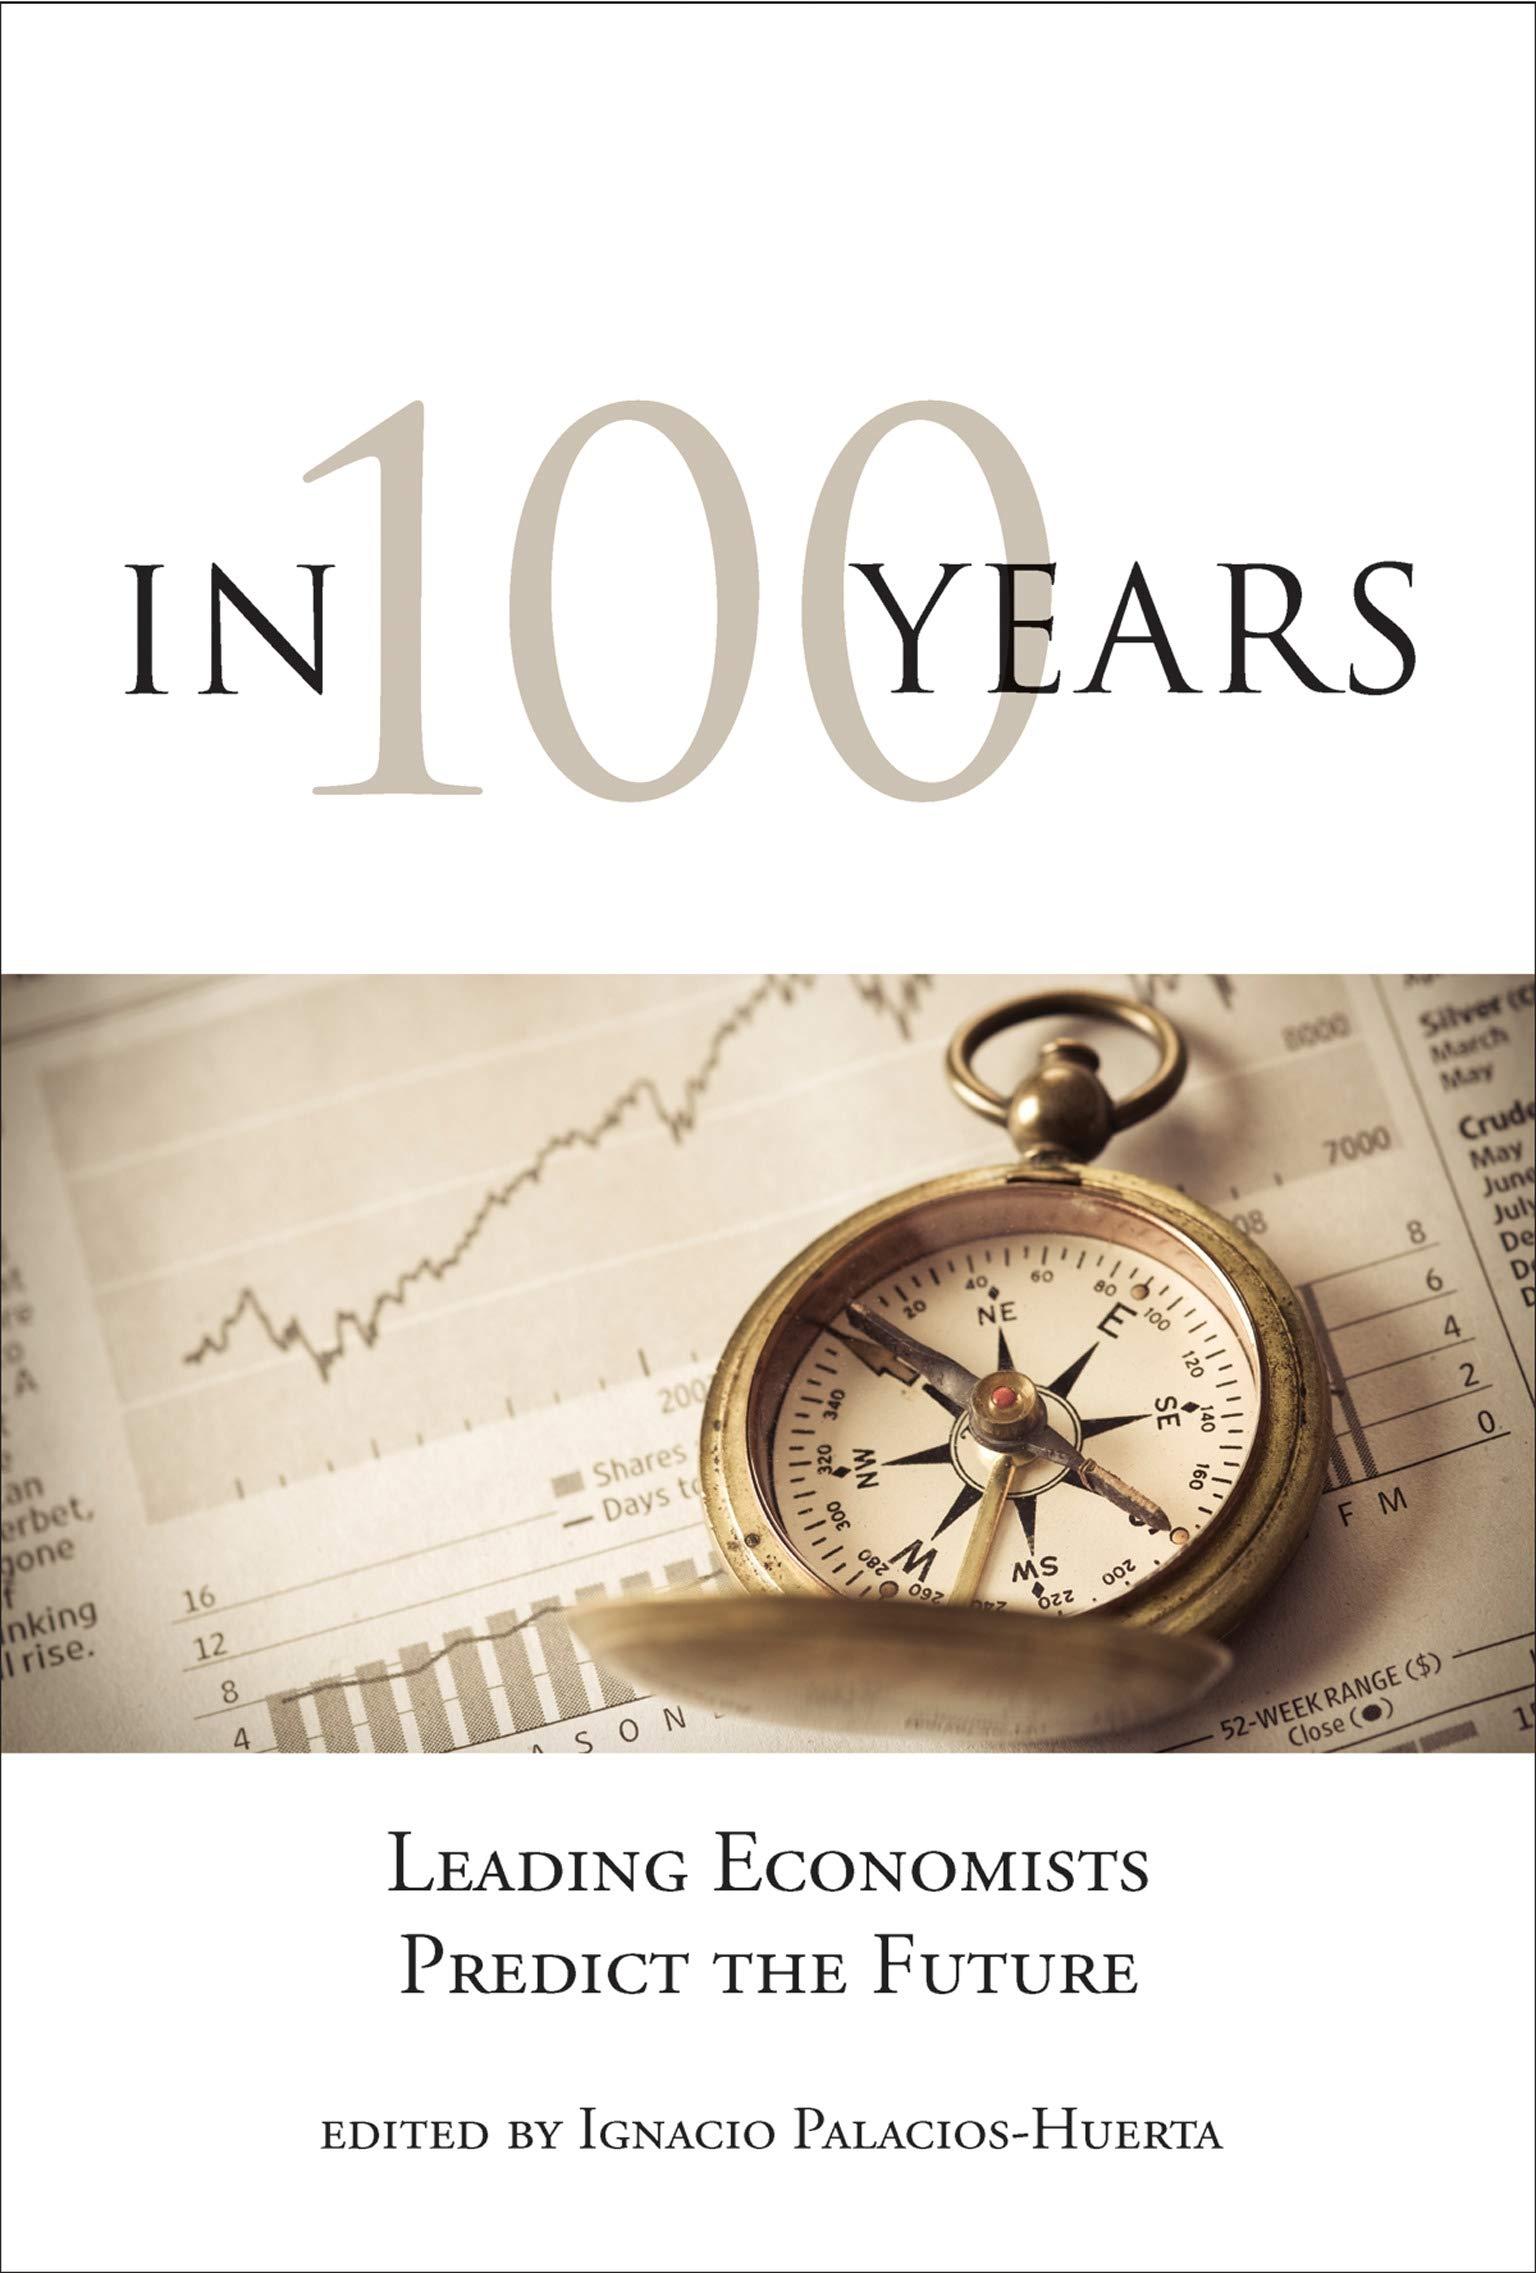 In 100 Years: Leading Economists Predict the Future The MIT Press: Amazon.es: Palacios-Huerta, Ignacio, Palacios-Huerta, Ignacio, Acemoglu, Daron, Deaton, Angus, Dixit, Avinash K., Glaeser, Edward L., Mas-Colell, Andreu, Roemer, John, Roth, Alvin